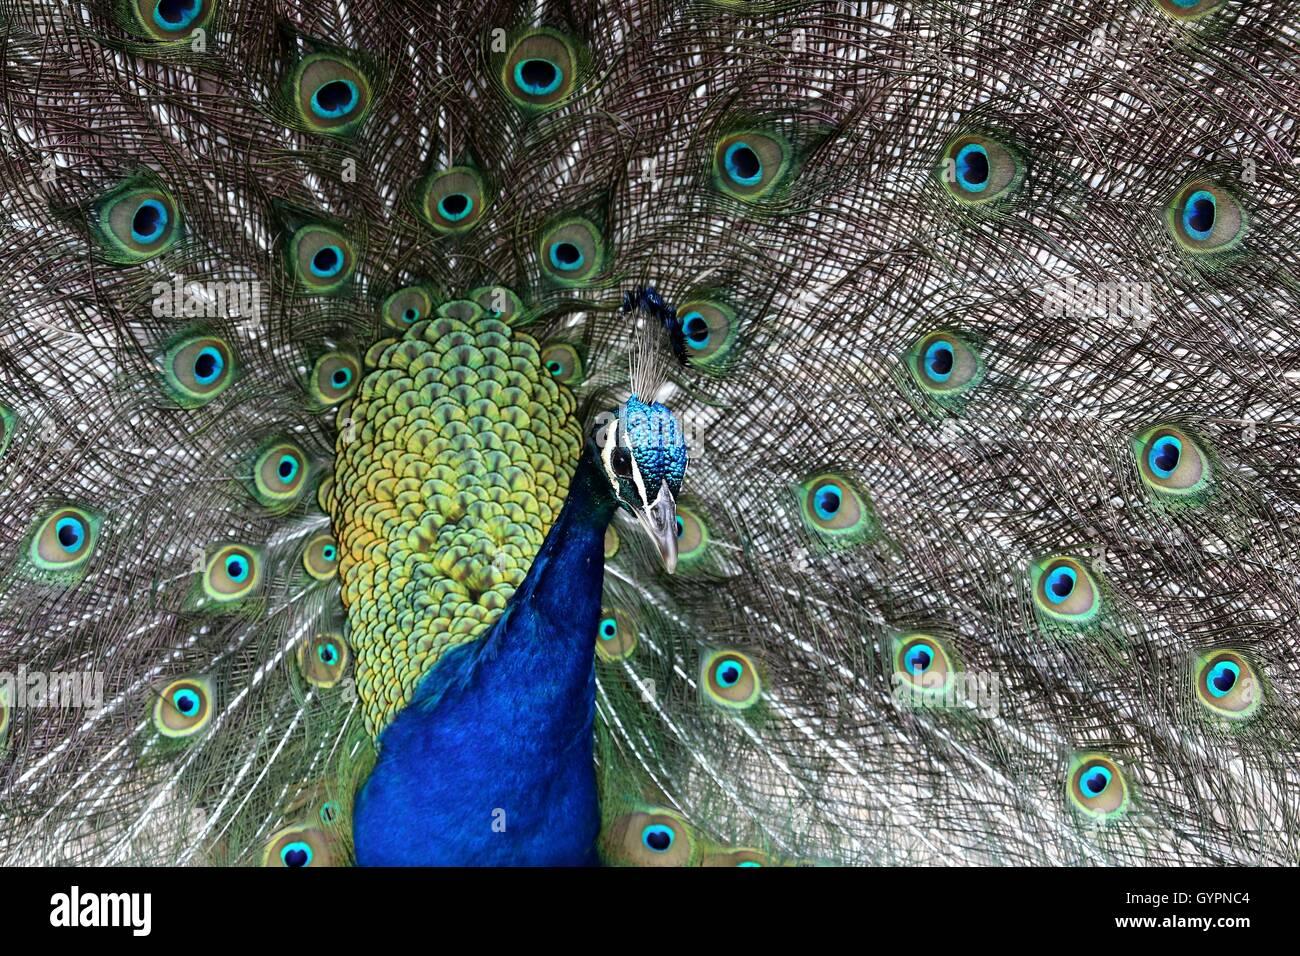 Peacock Display - Stock Image